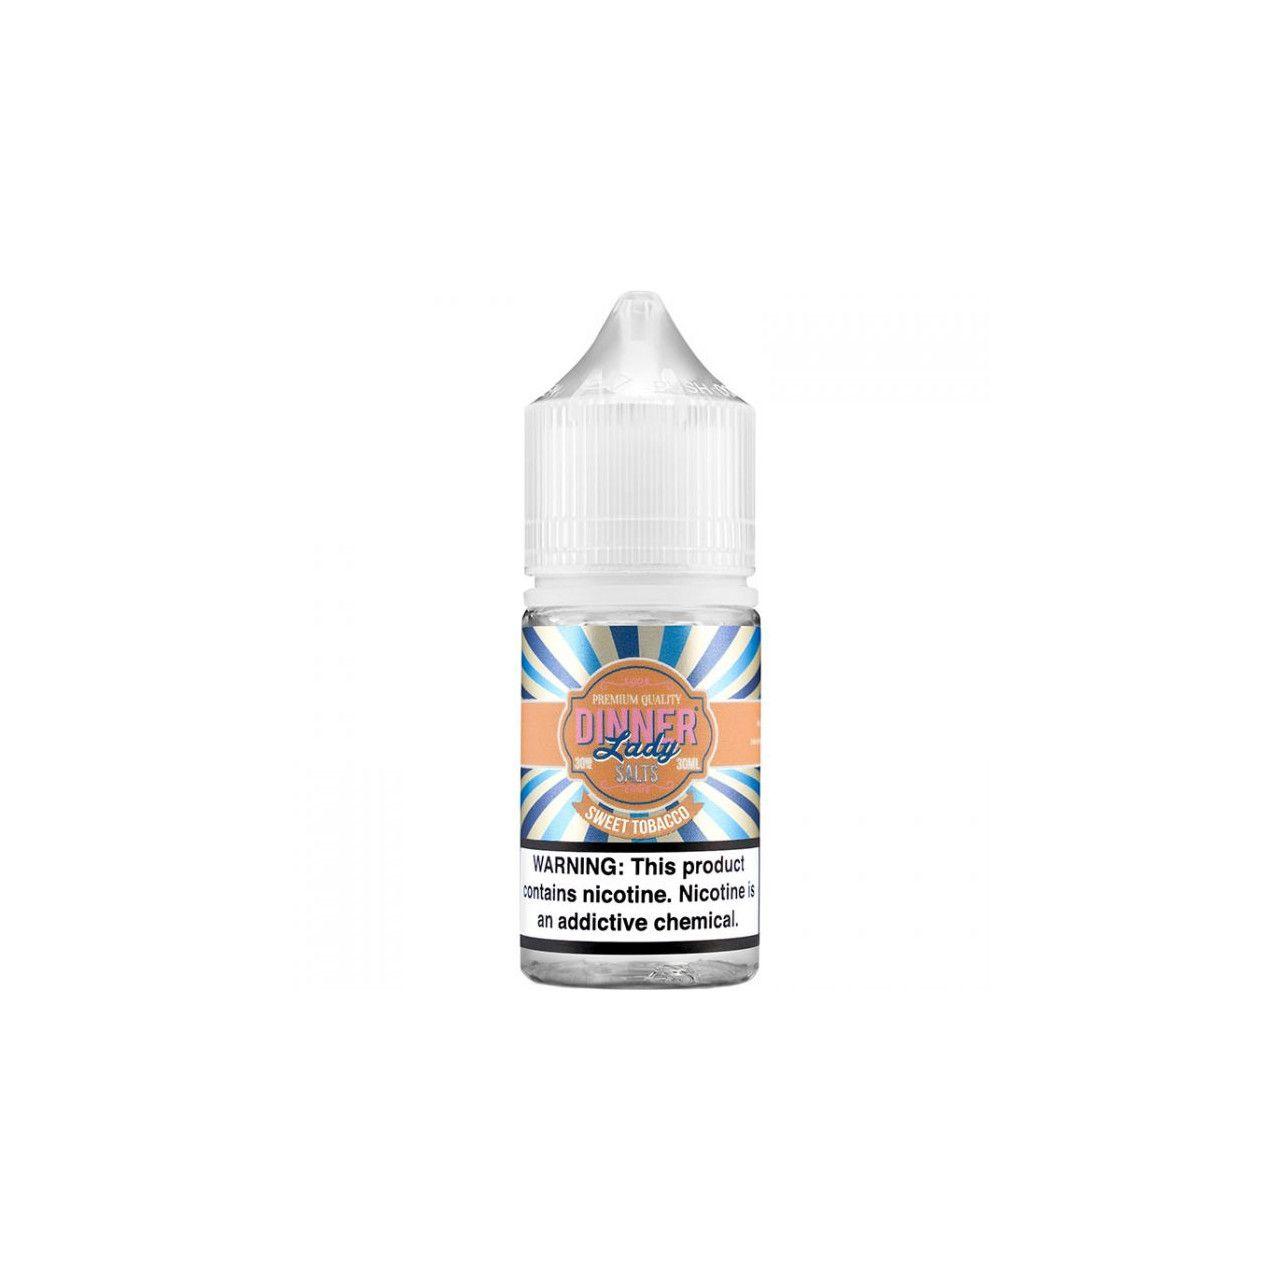 Líquido (Juice) - Nic Salt - Dinner Lady - Sweet Tobacco